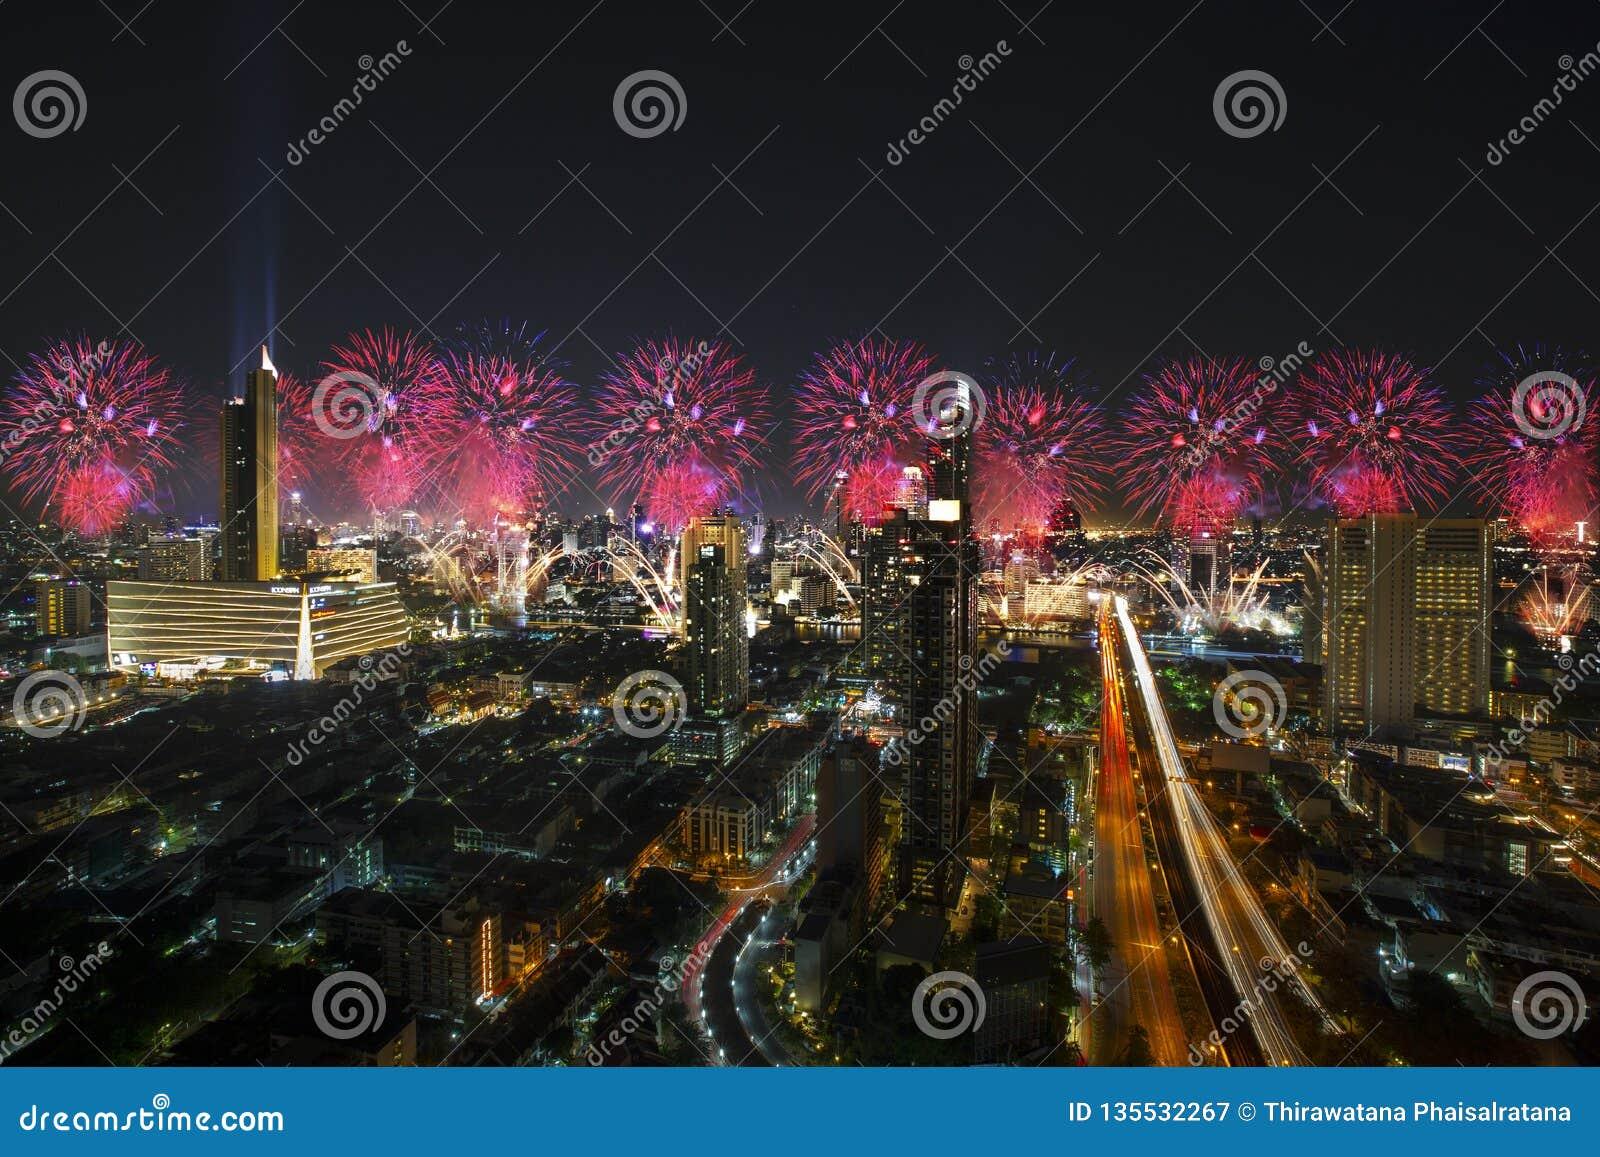 Bangkok Cityscape, Fireworks Celebration In The Business